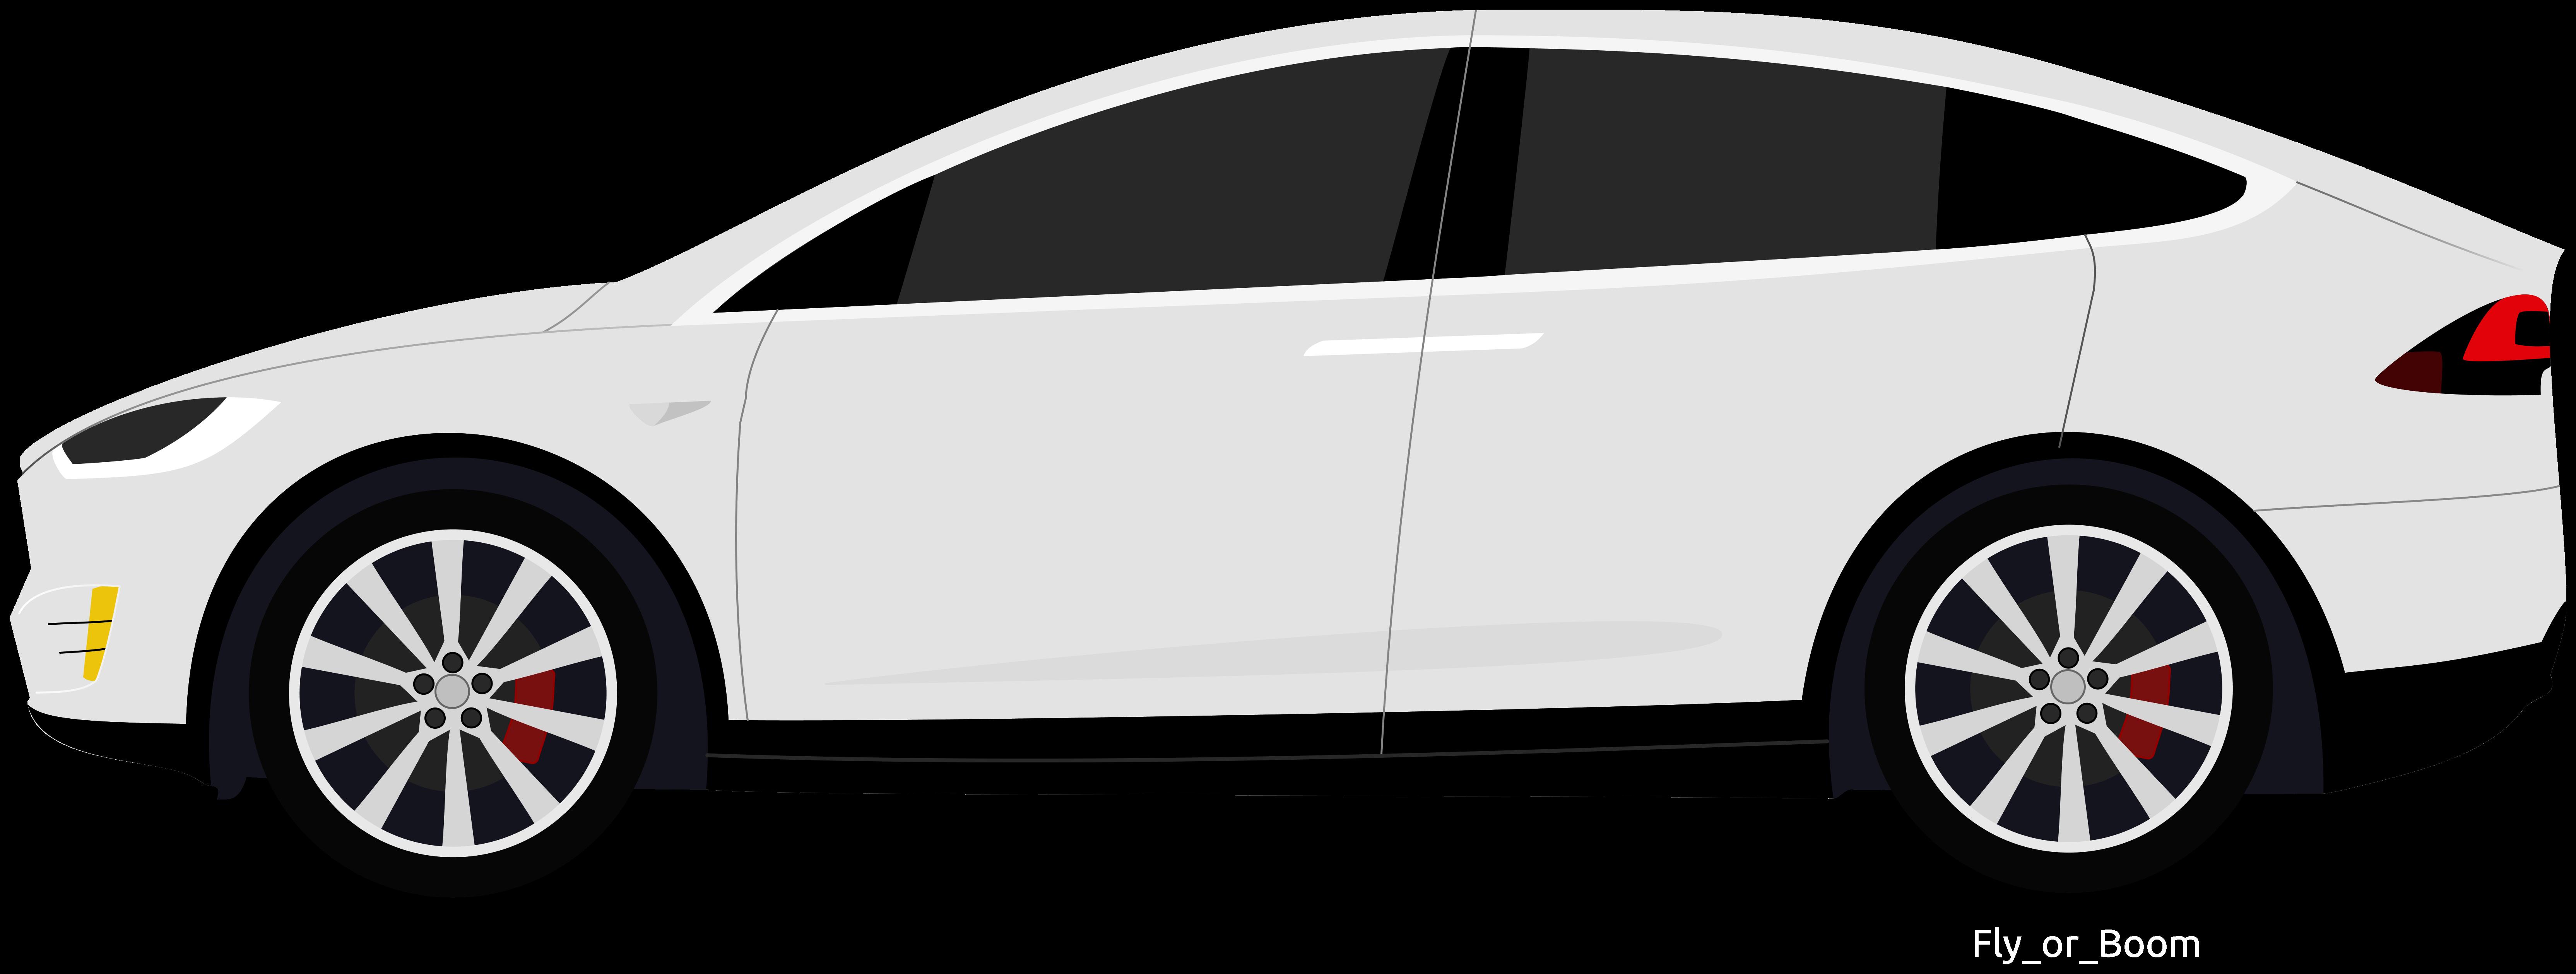 Tesla car clipart clipart stock Fan-made Tesla Cars & Supercharger Cliparts - Album on Imgur clipart stock